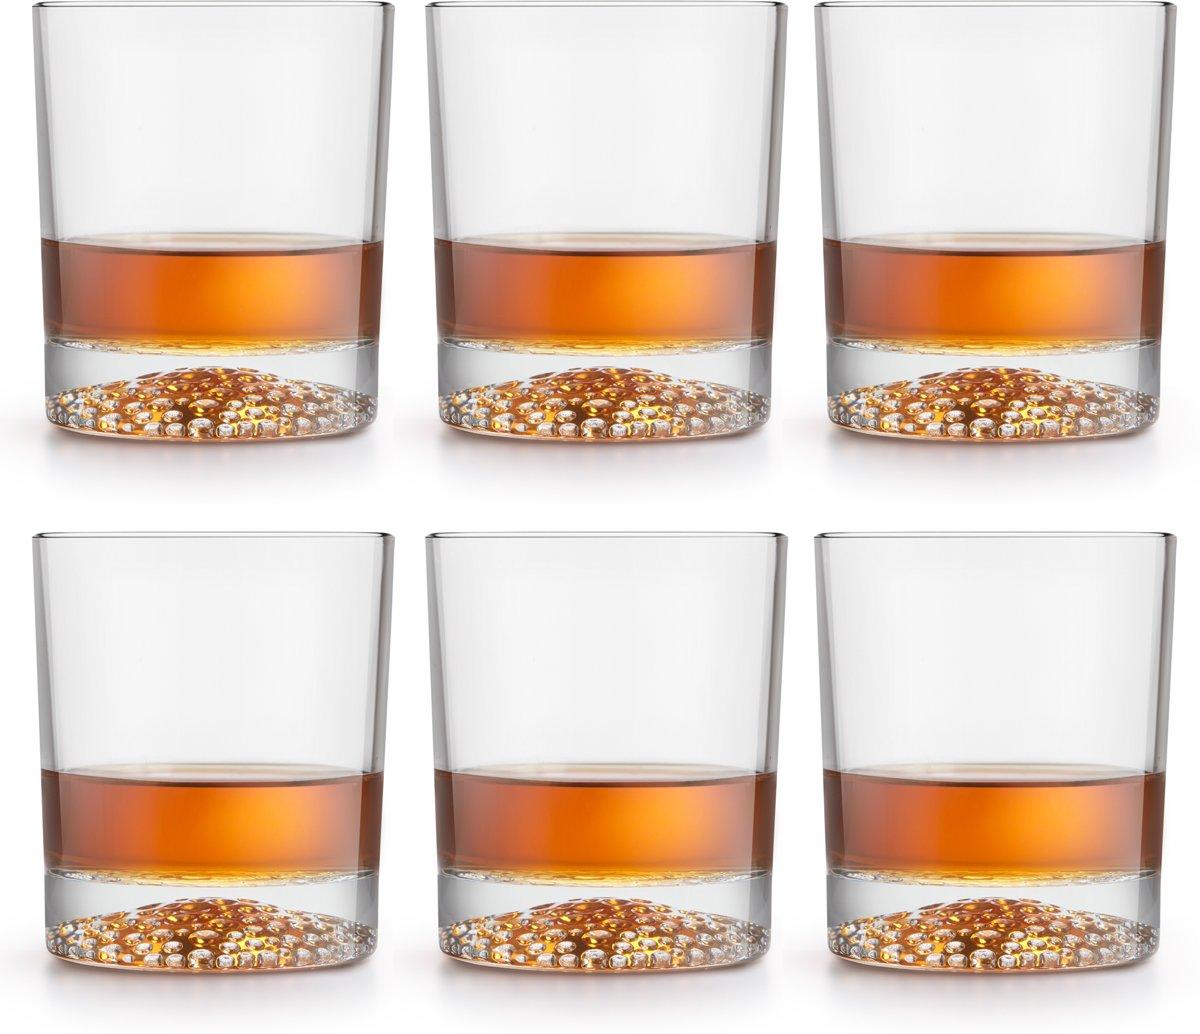 Libbey Whiskyglas – Gles – 30 cl / 300 ml - 6 stuks - hoge kwaliteit - luxe design - vaatwasserbestendig kopen